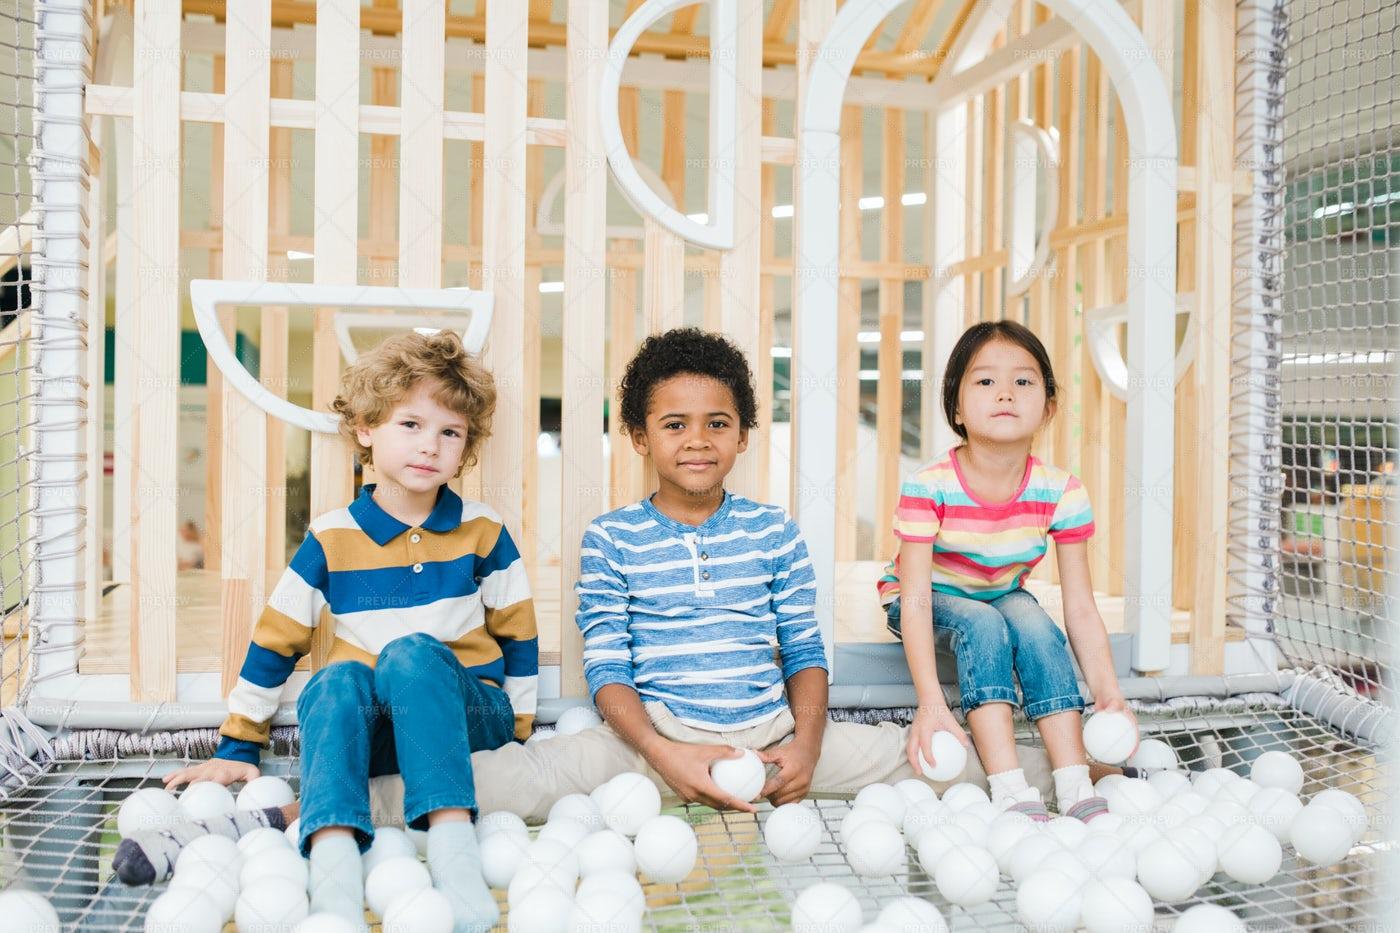 Three Cute Children Of Various...: Stock Photos